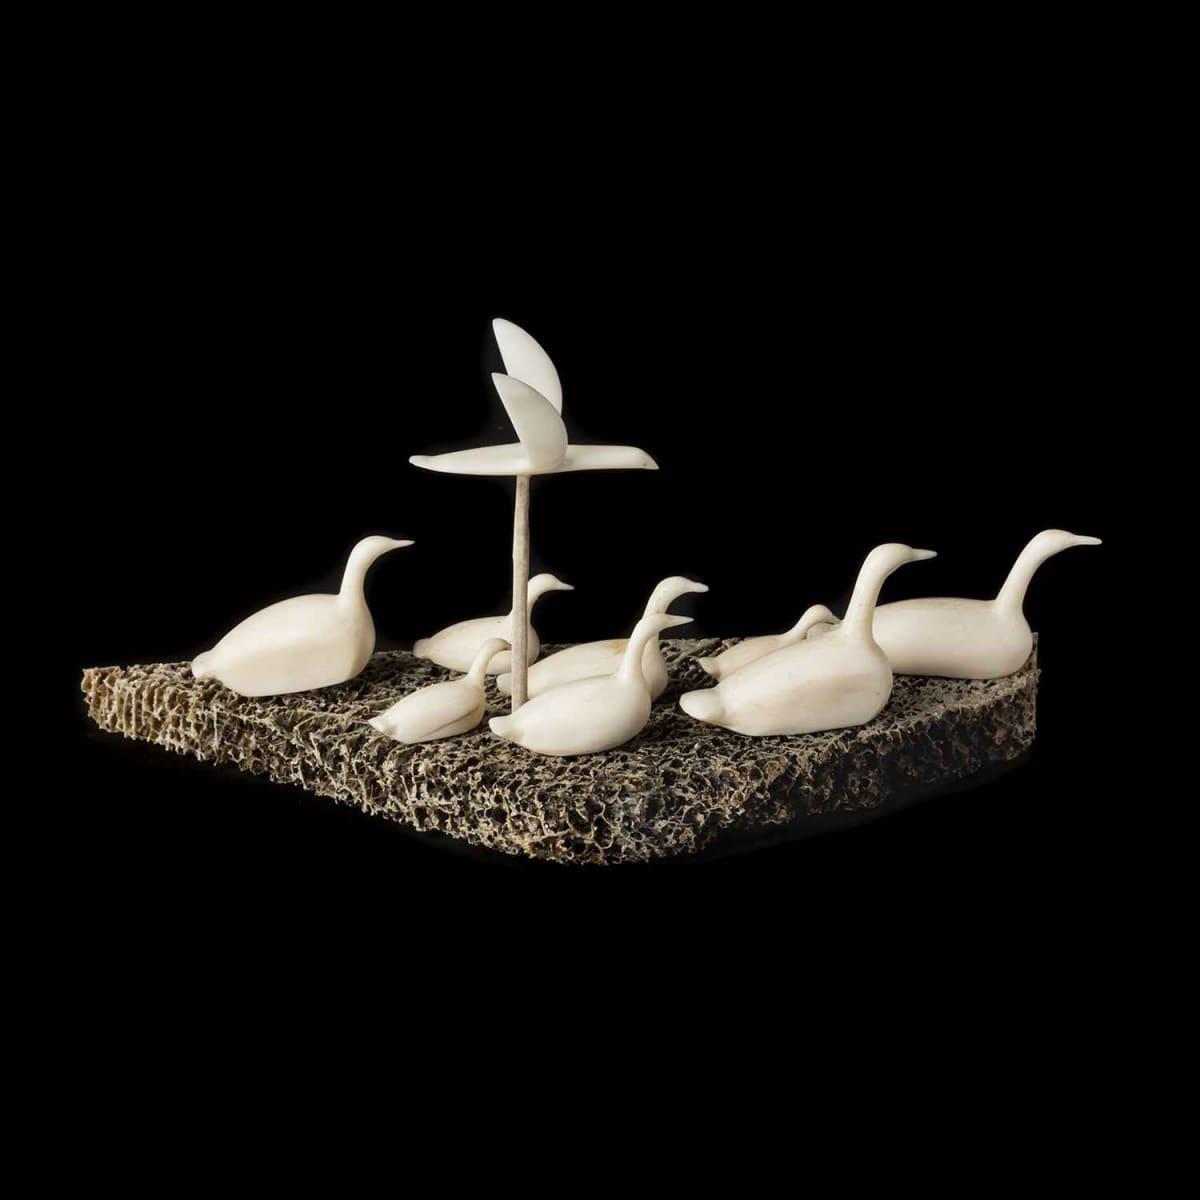 12. UNIDENTIFIED ARTIST, KUGAARUK (PELLY BAY) Nine Swimming and Flying Bird, 1970